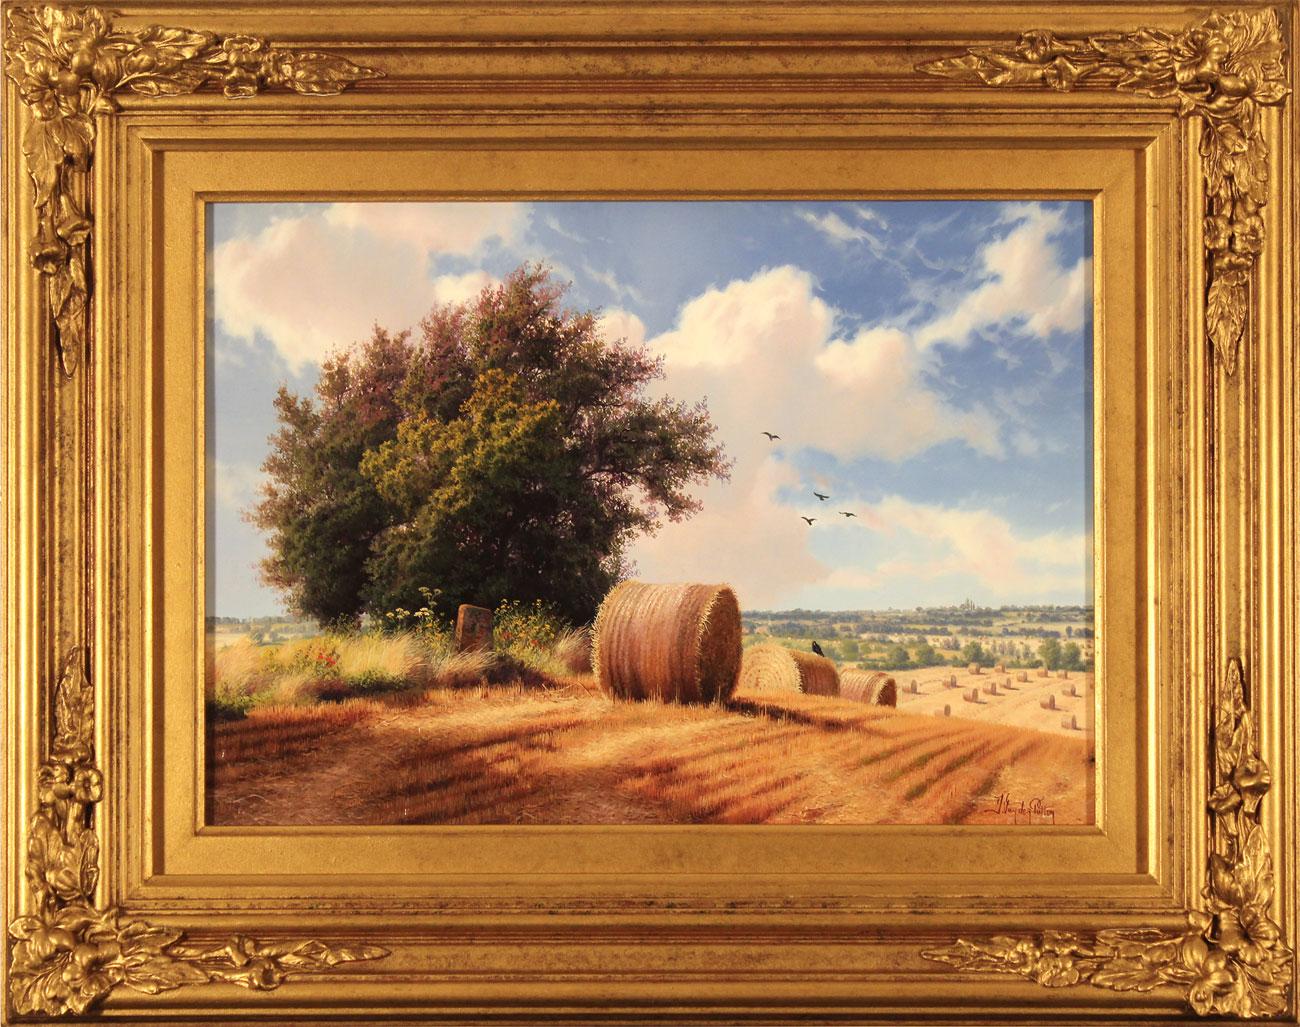 Daniel Van Der Putten, Original oil painting on panel, Summer on Weedon Hill Click to enlarge